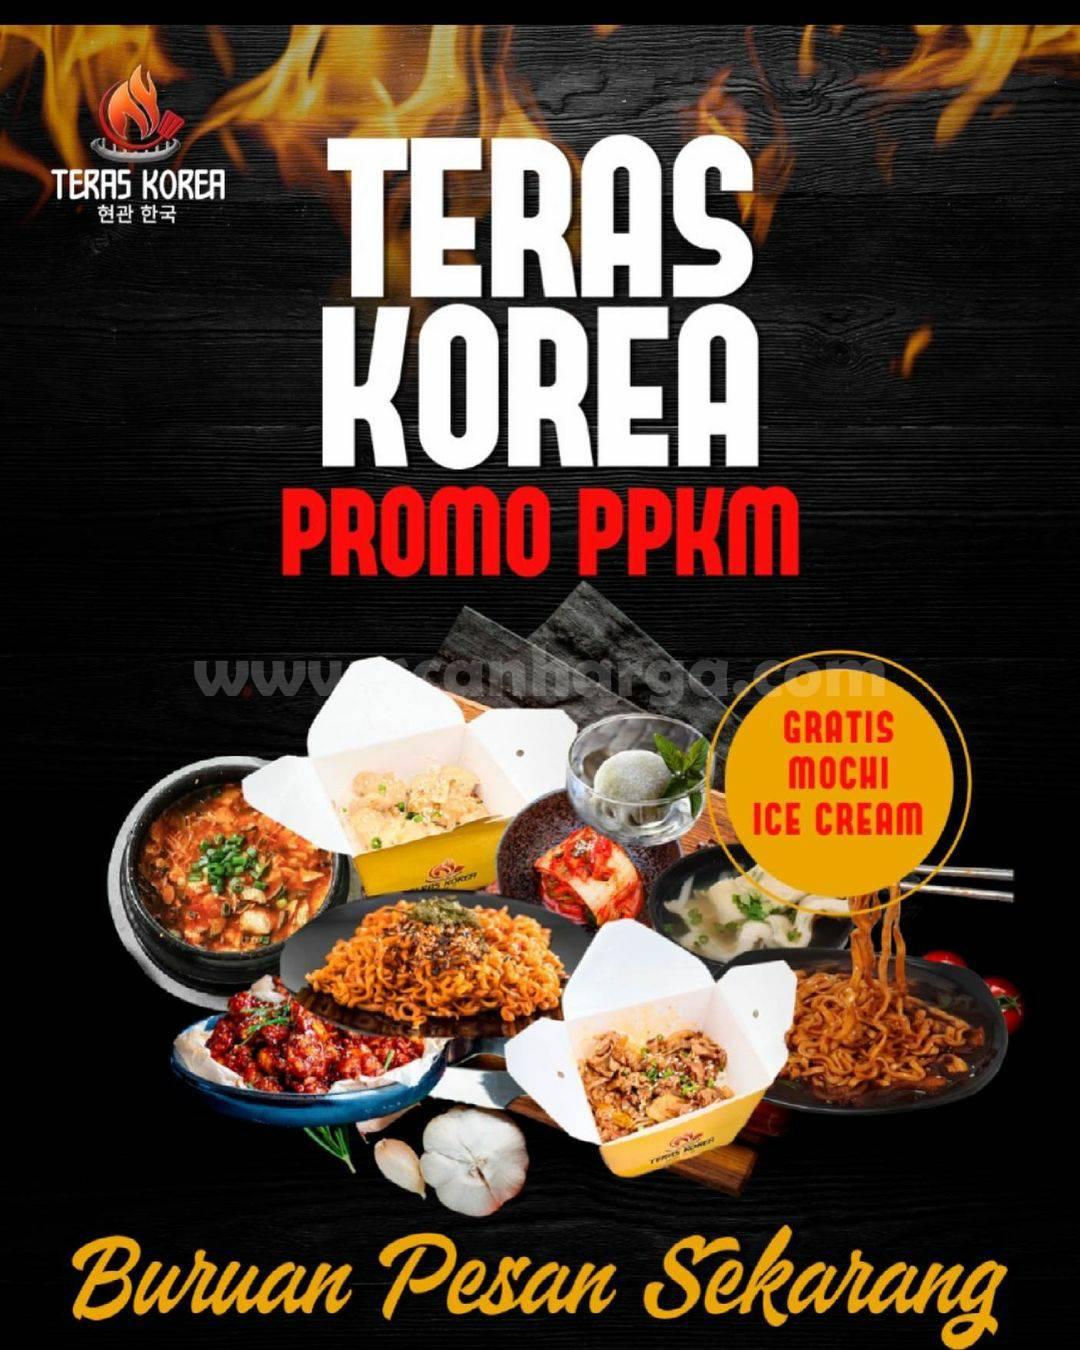 Teras Korea Promo PPKM Gratis Mochi Ice Cream